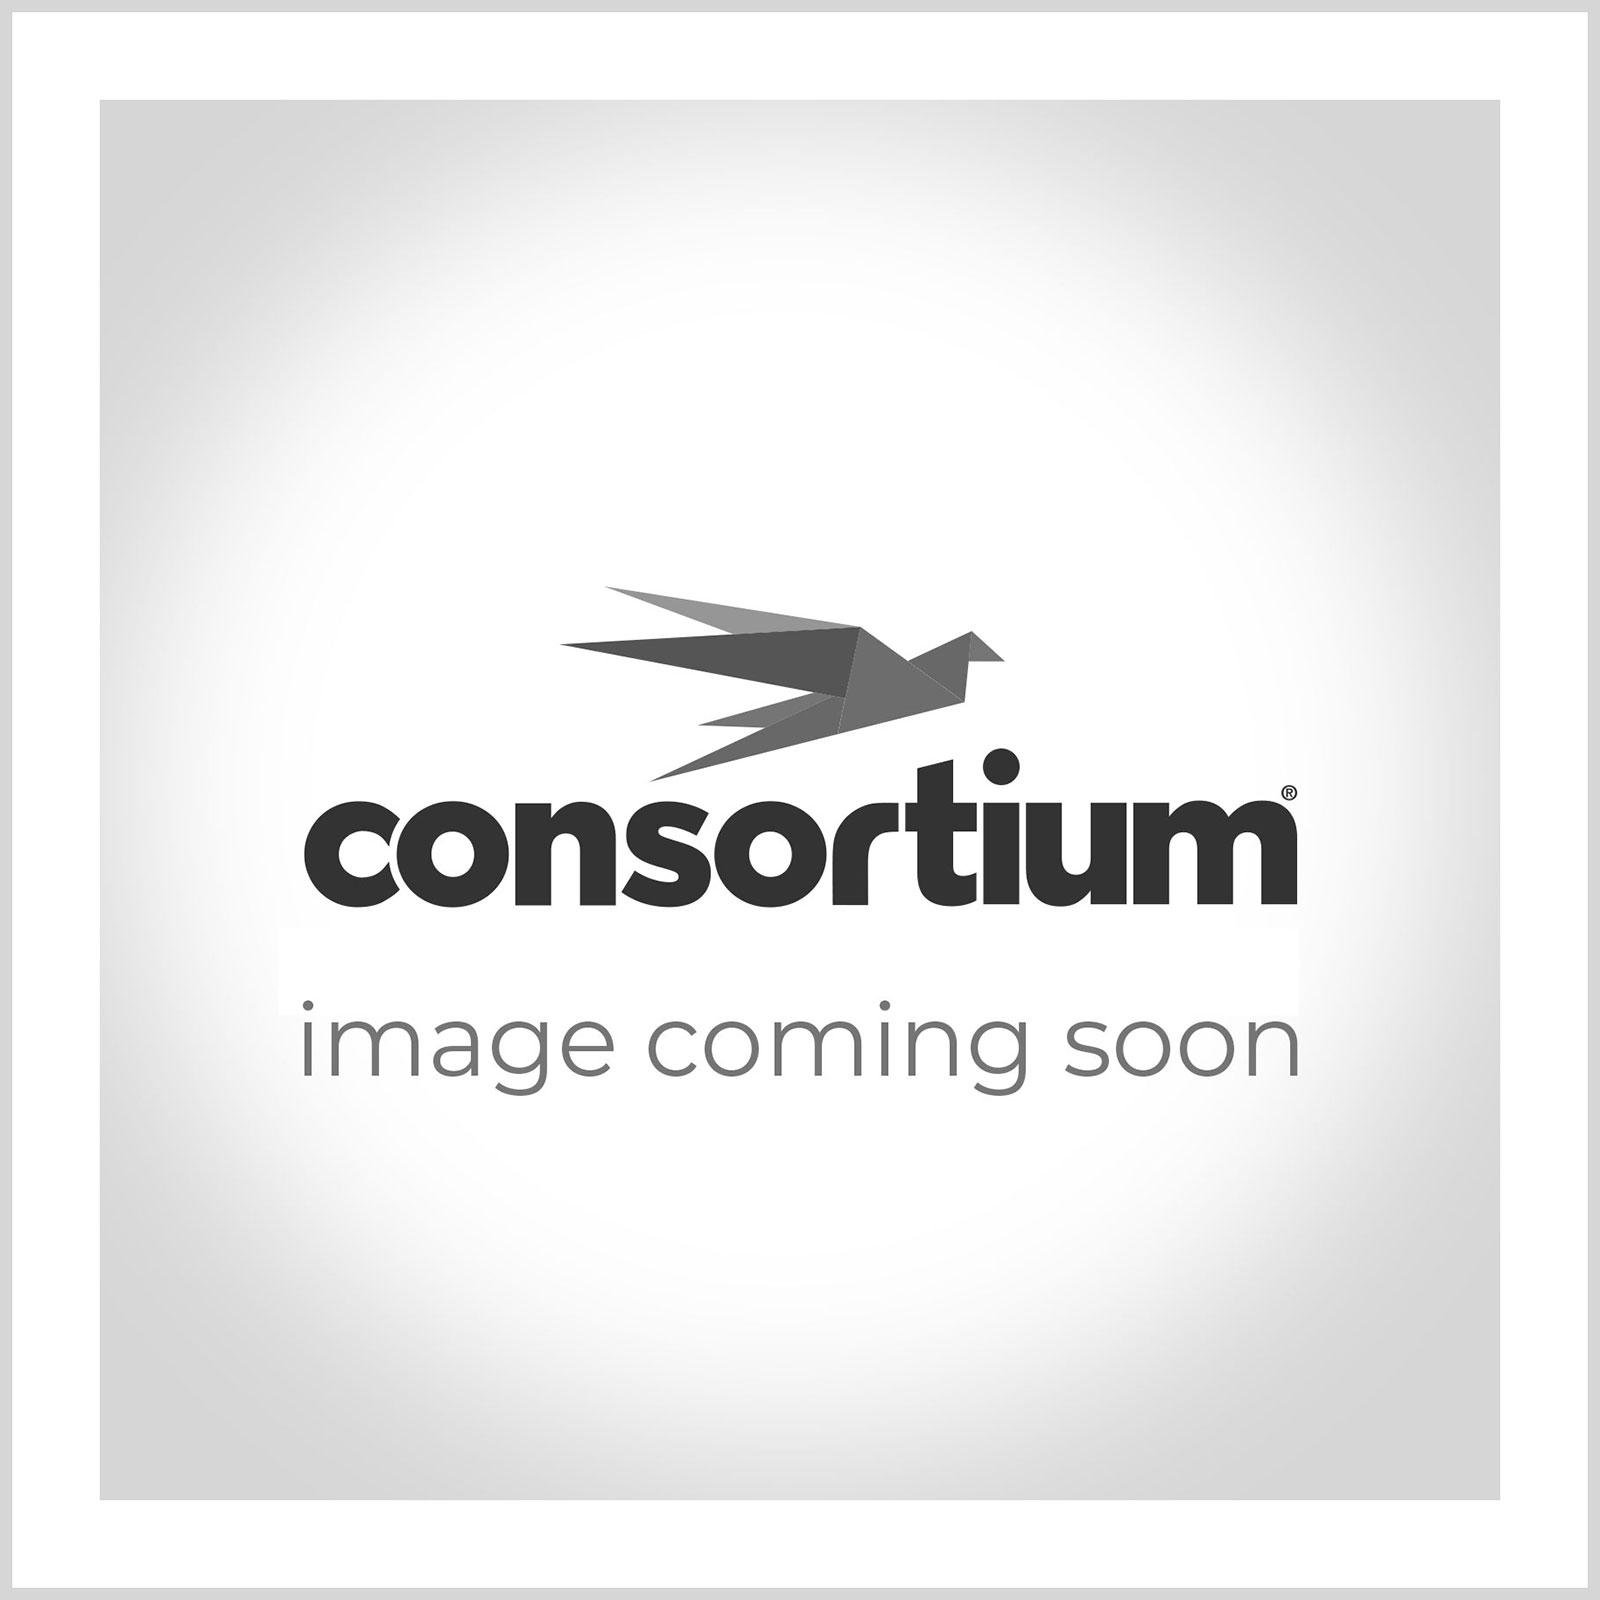 Consortium Hard Surface Cleaner